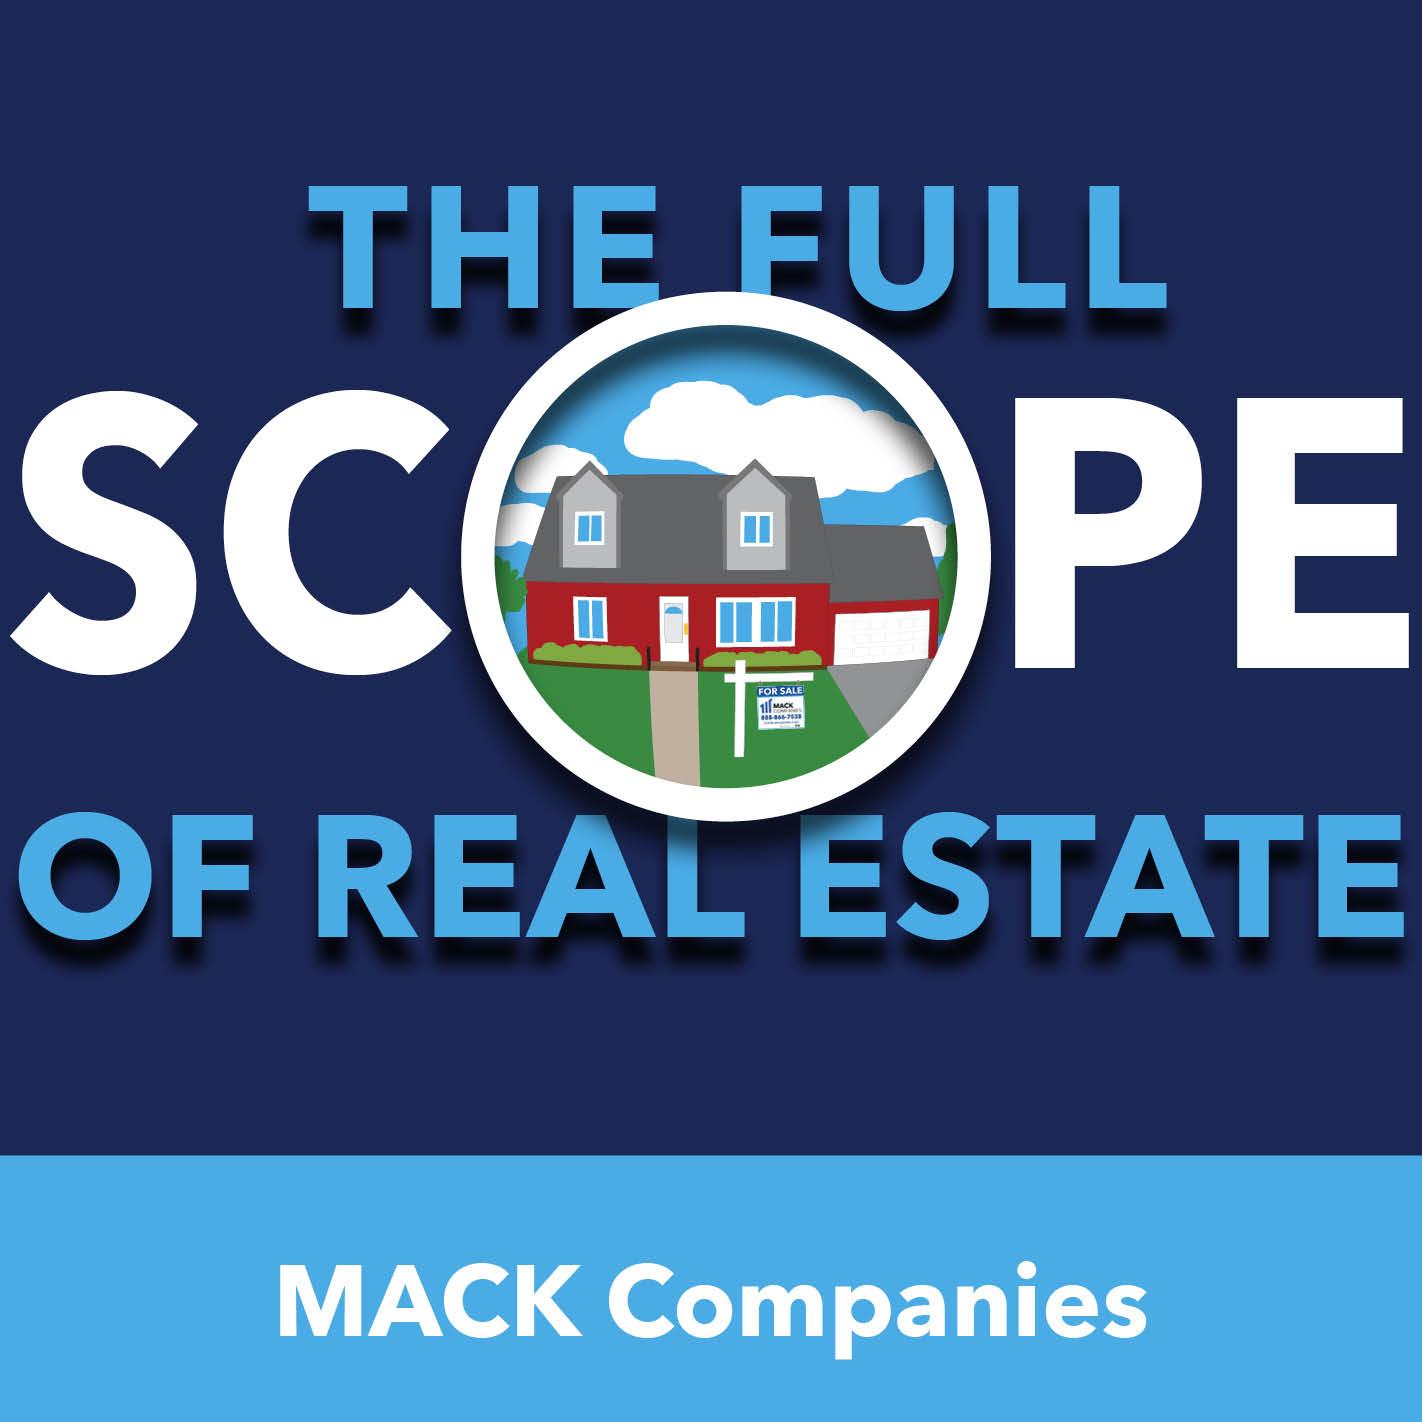 20150326_MACKCompanies_thefullscope_icon3.jpg